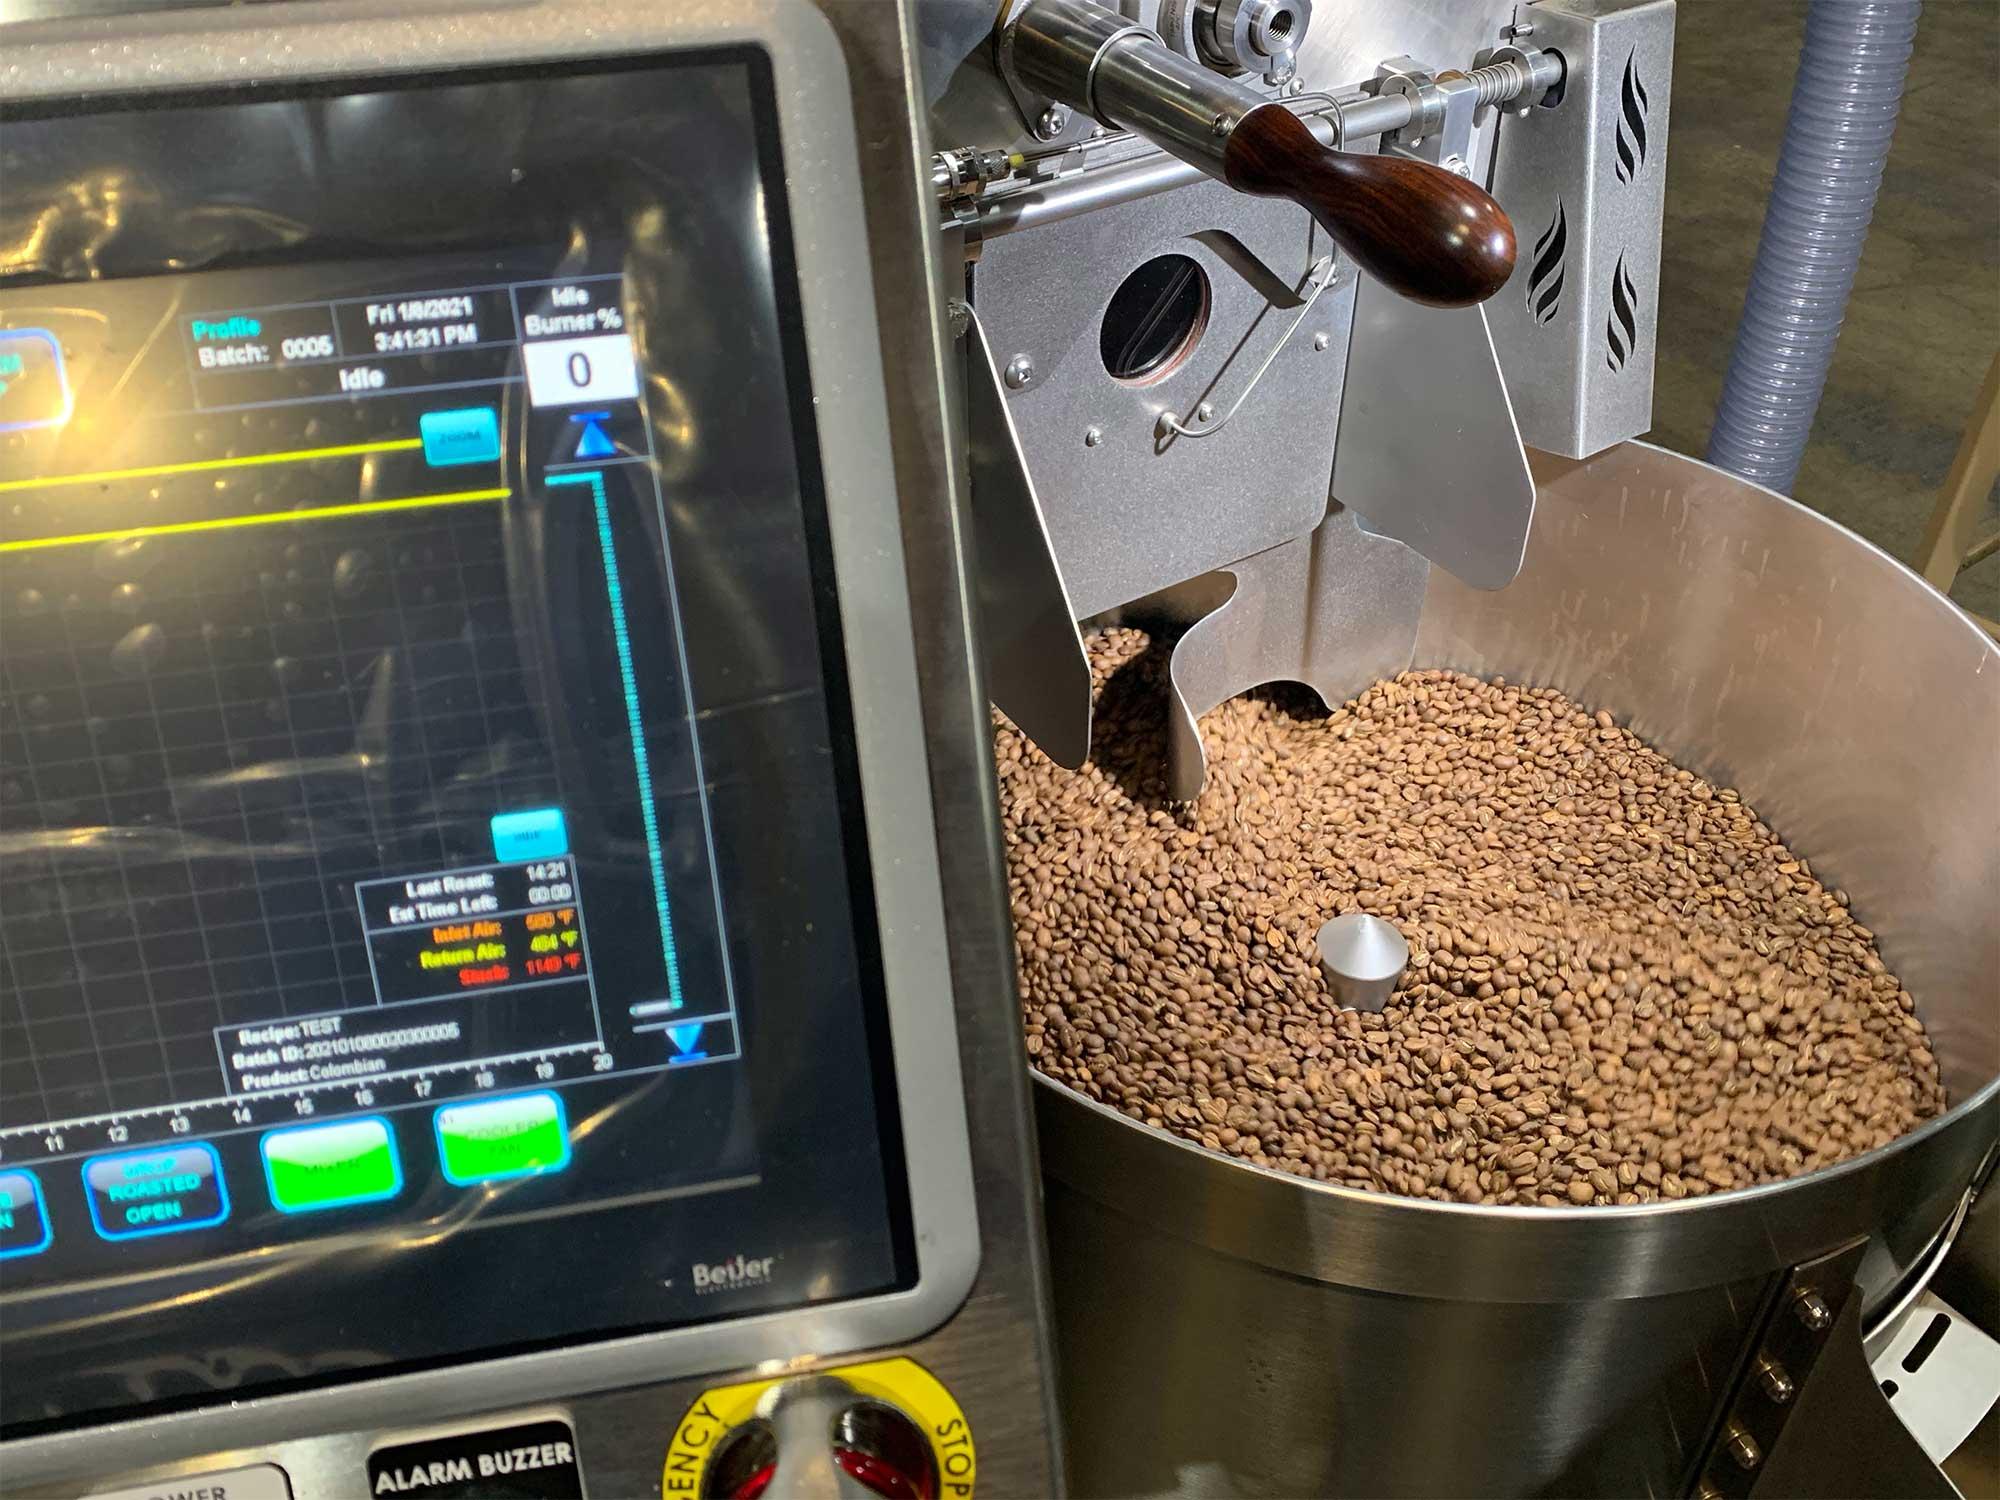 Loring S15 coffee roaster